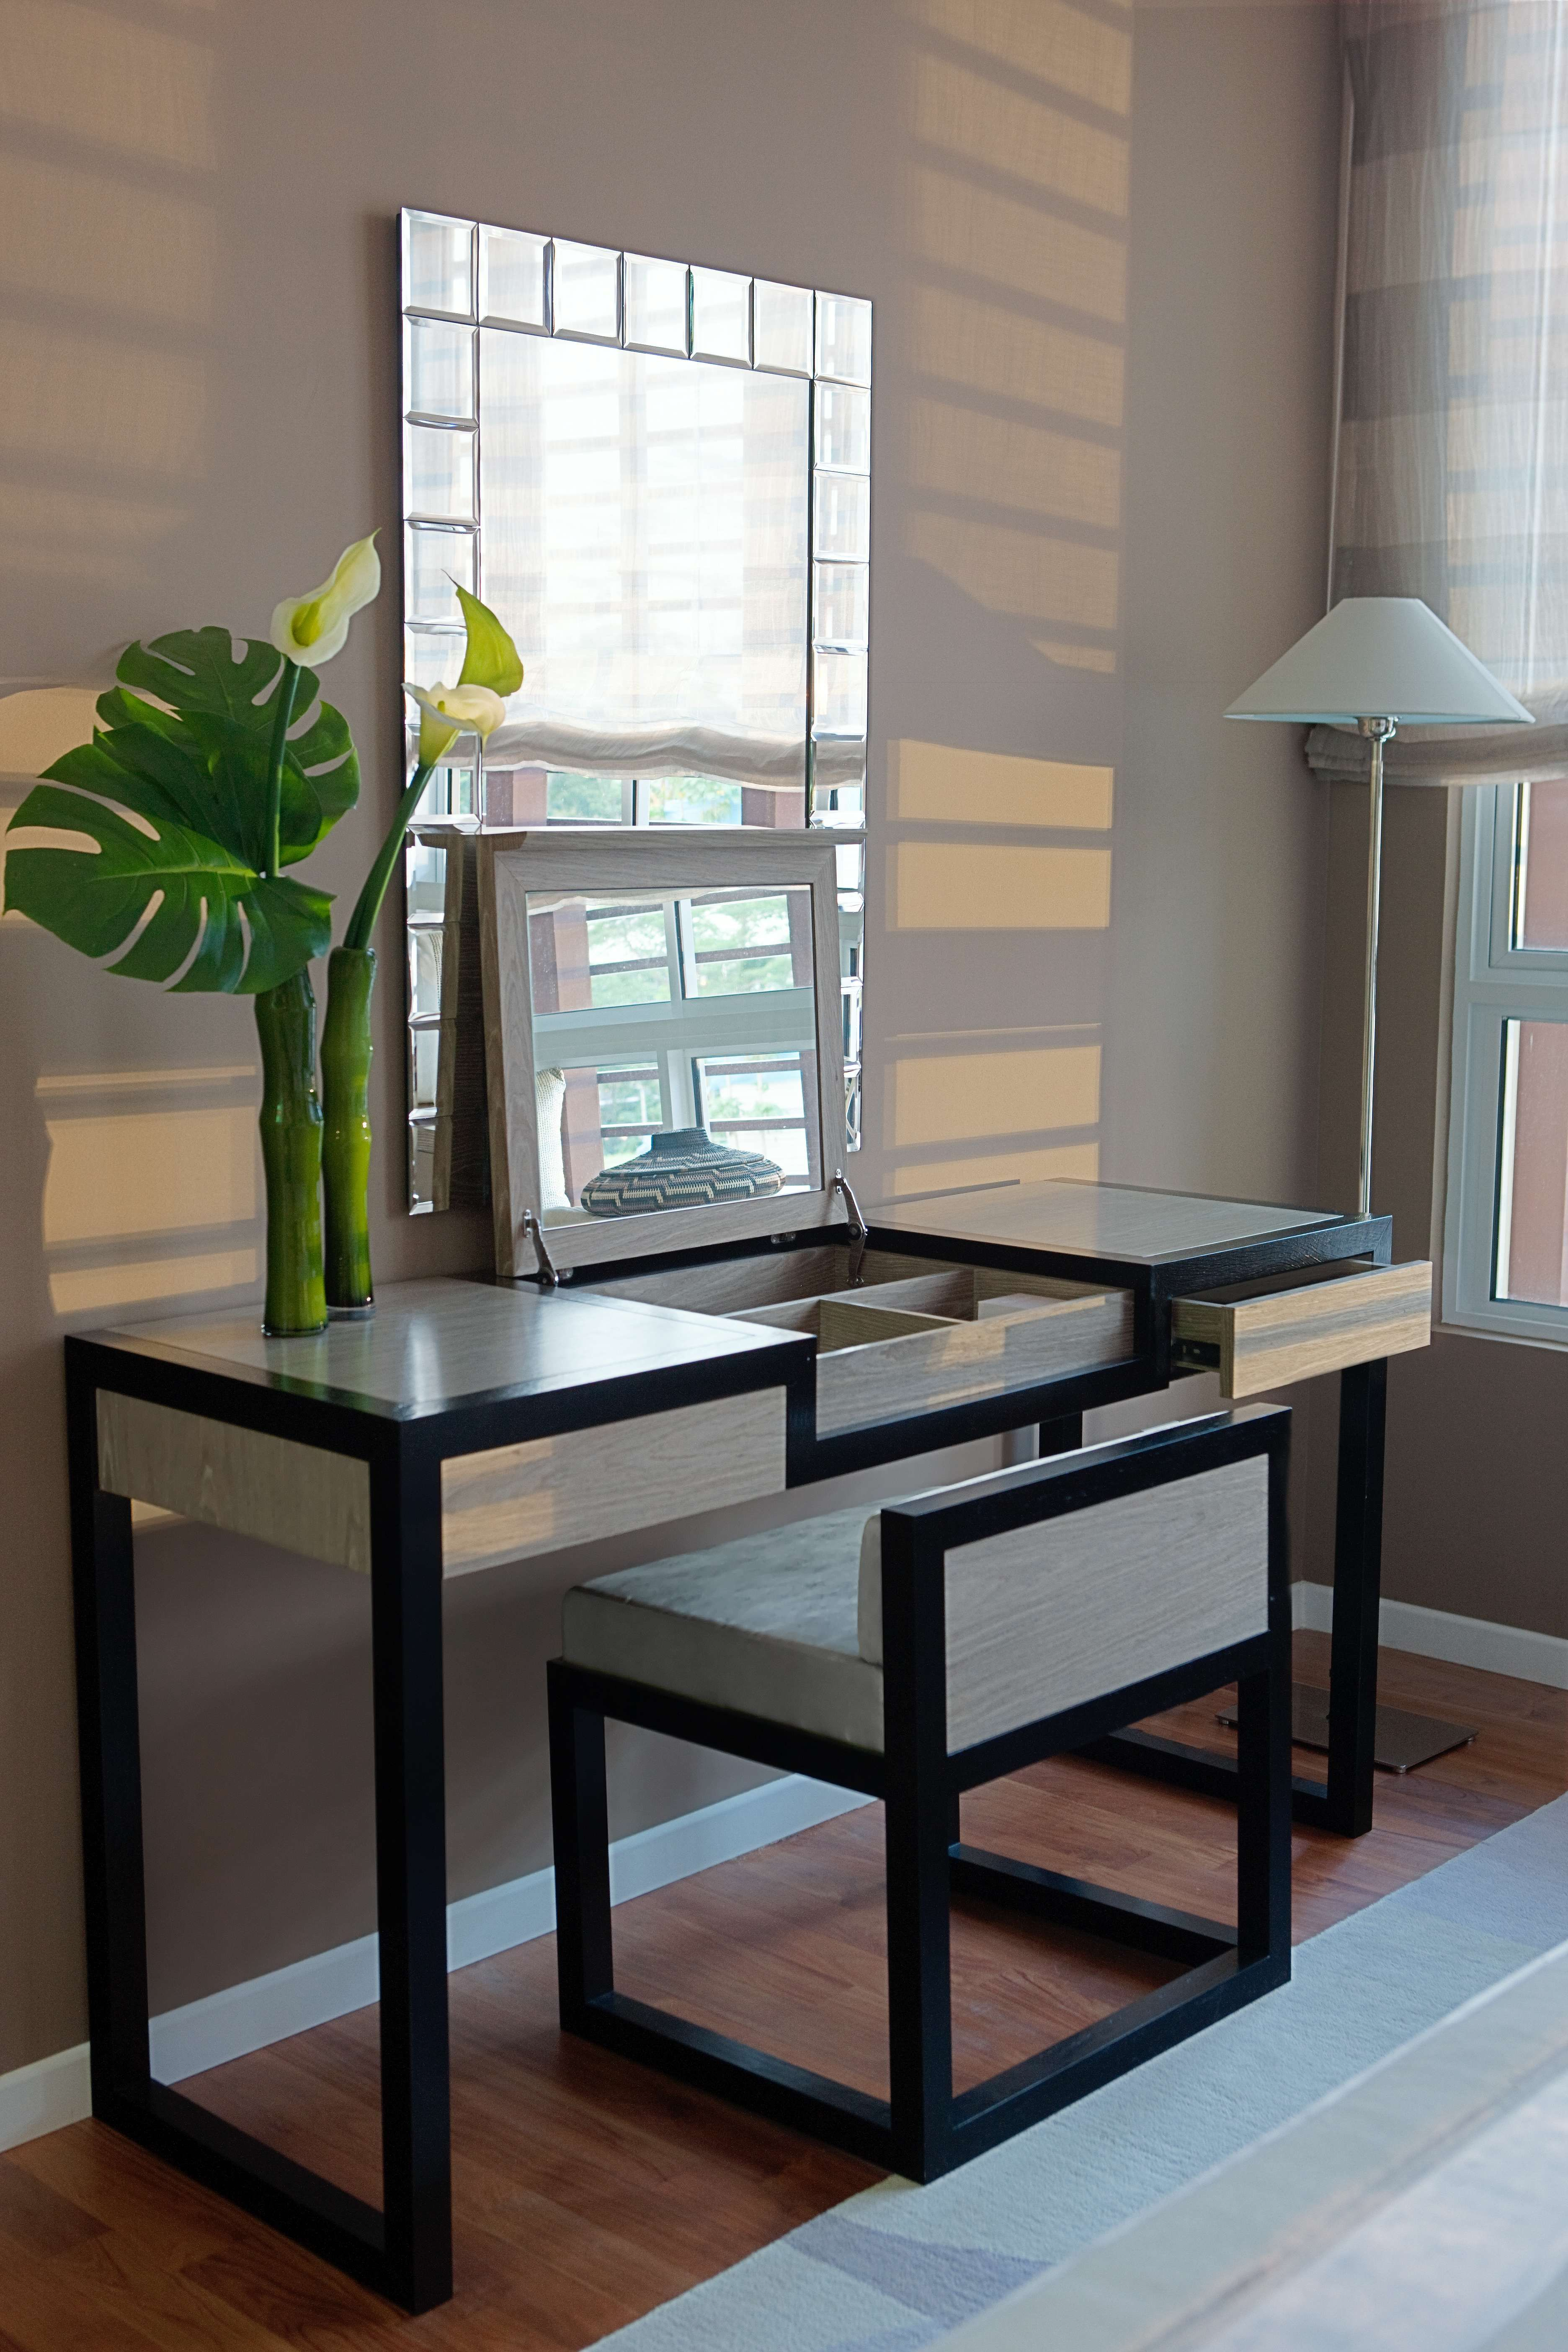 Furniture Modern Black Bedroom Vanity With Upholstered